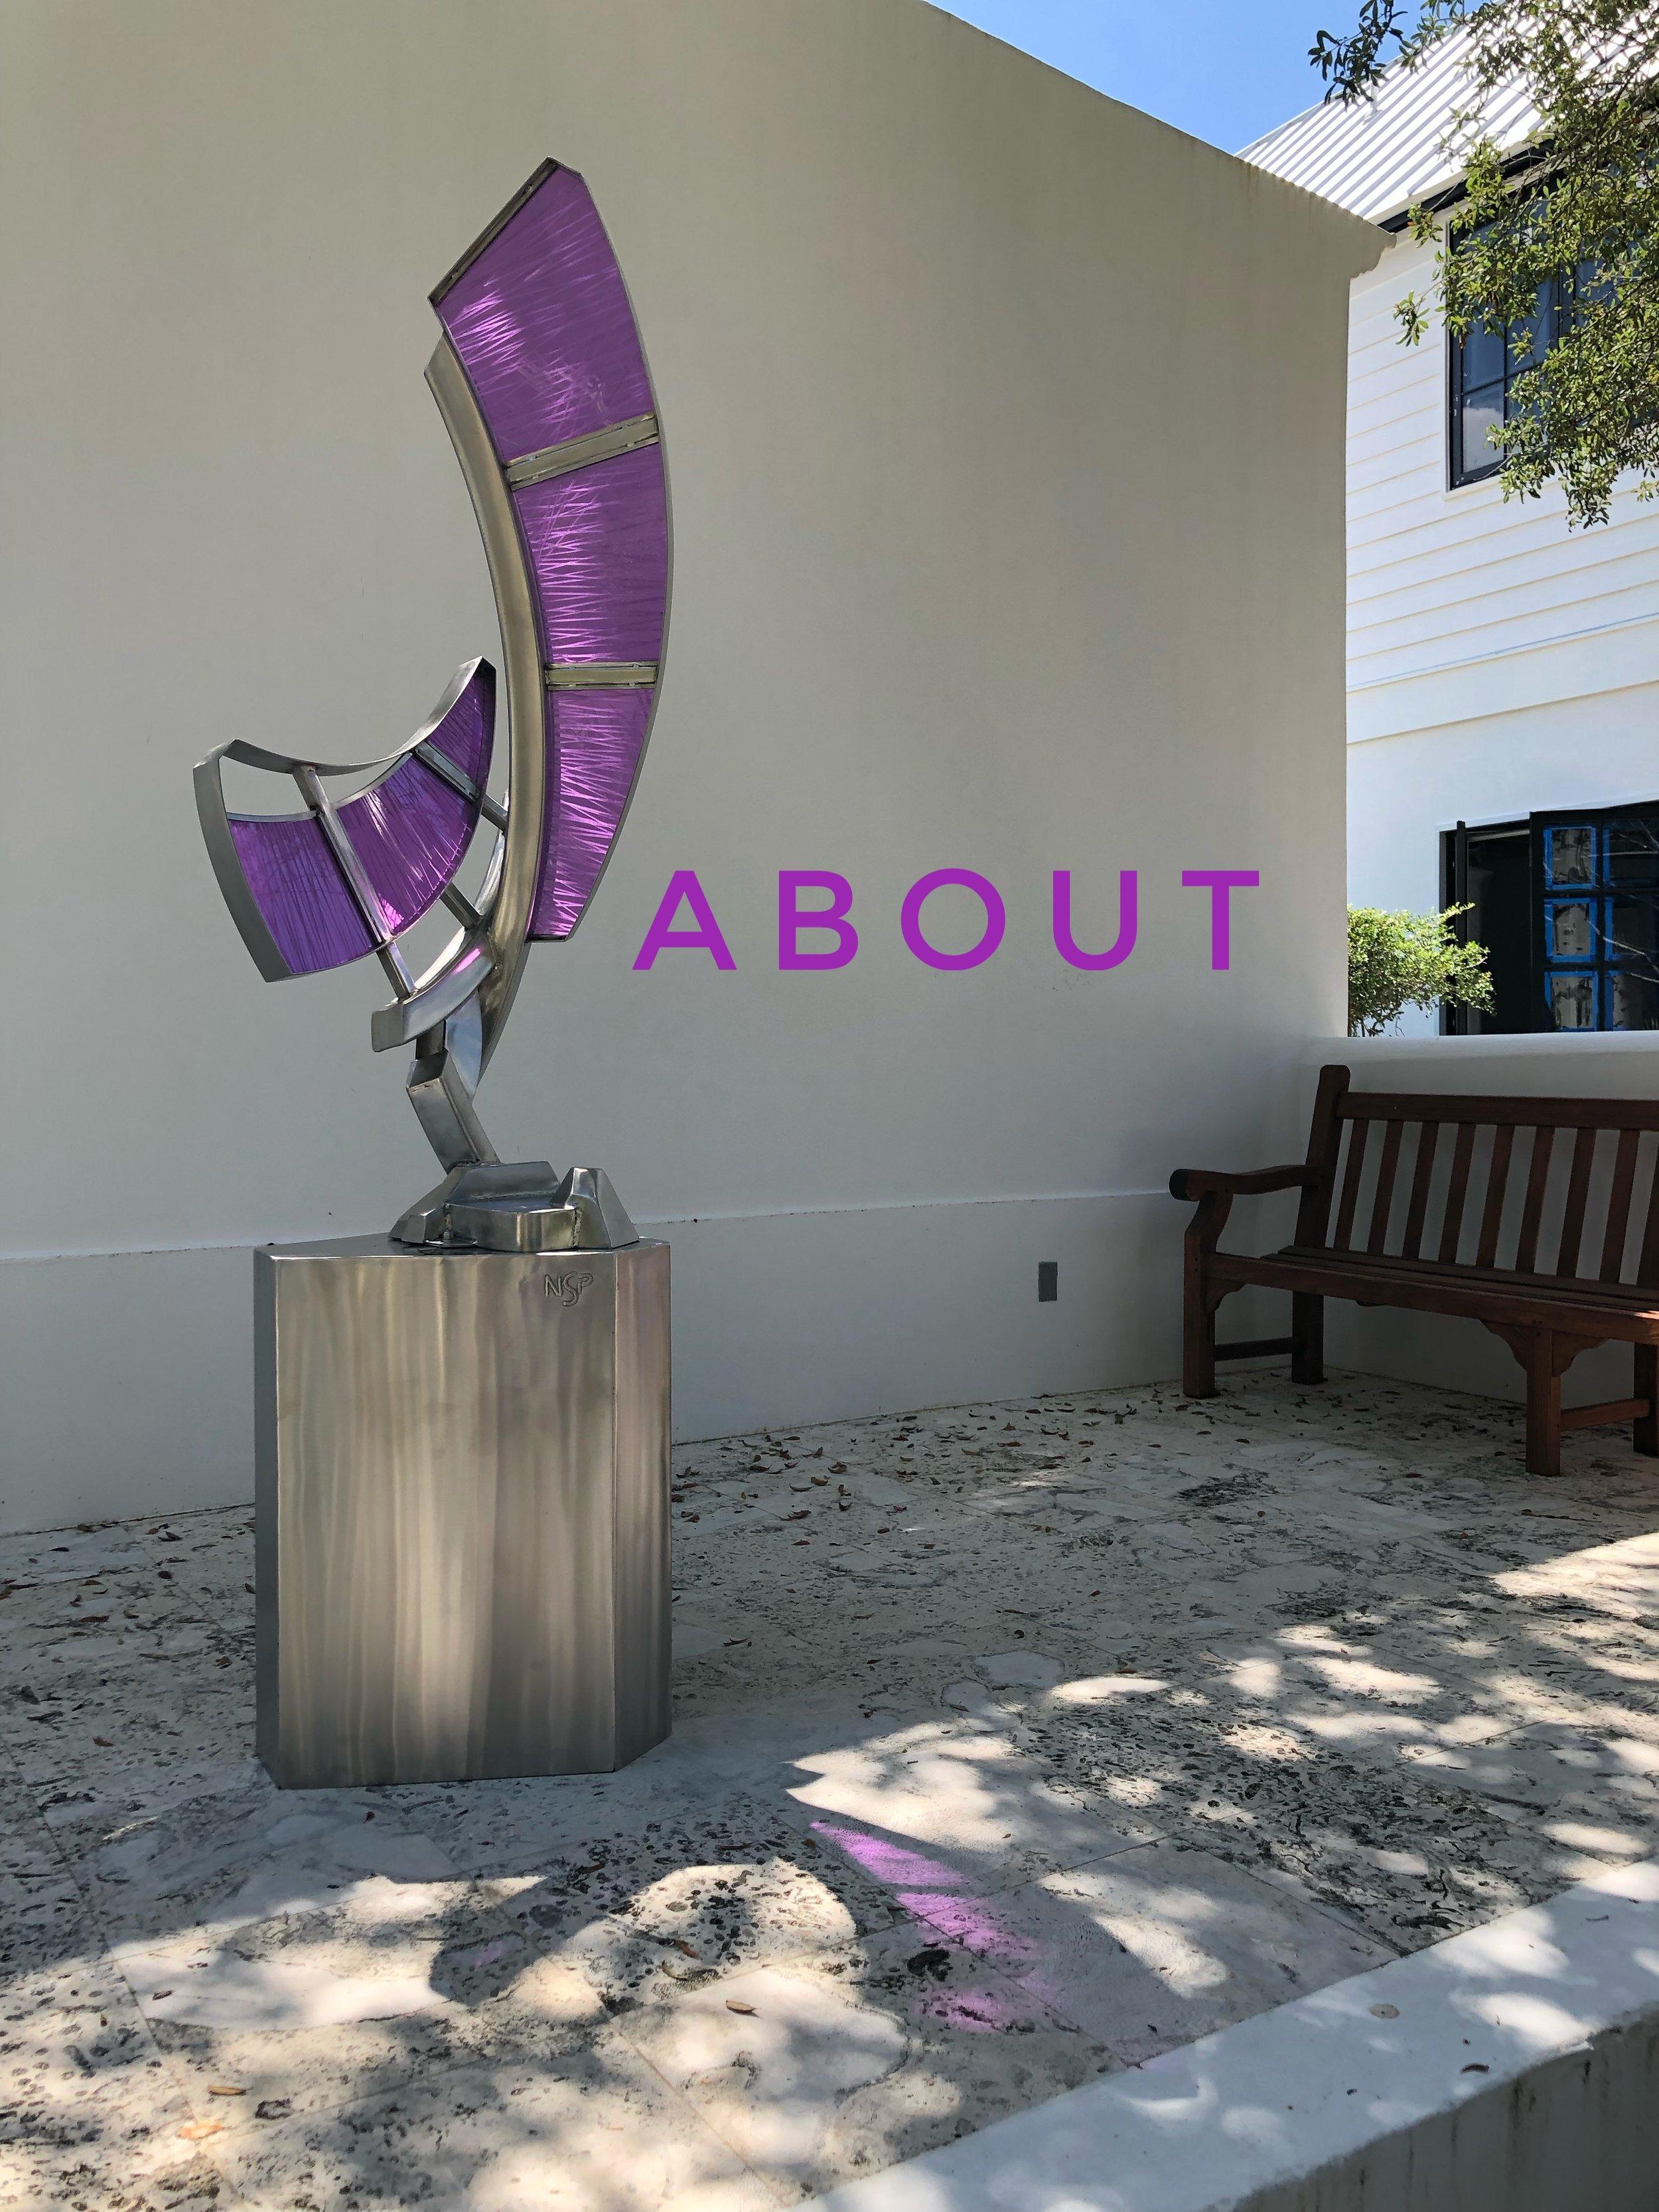 Public Sculpture Art Exhibition — Rosemary Beach Sculpture